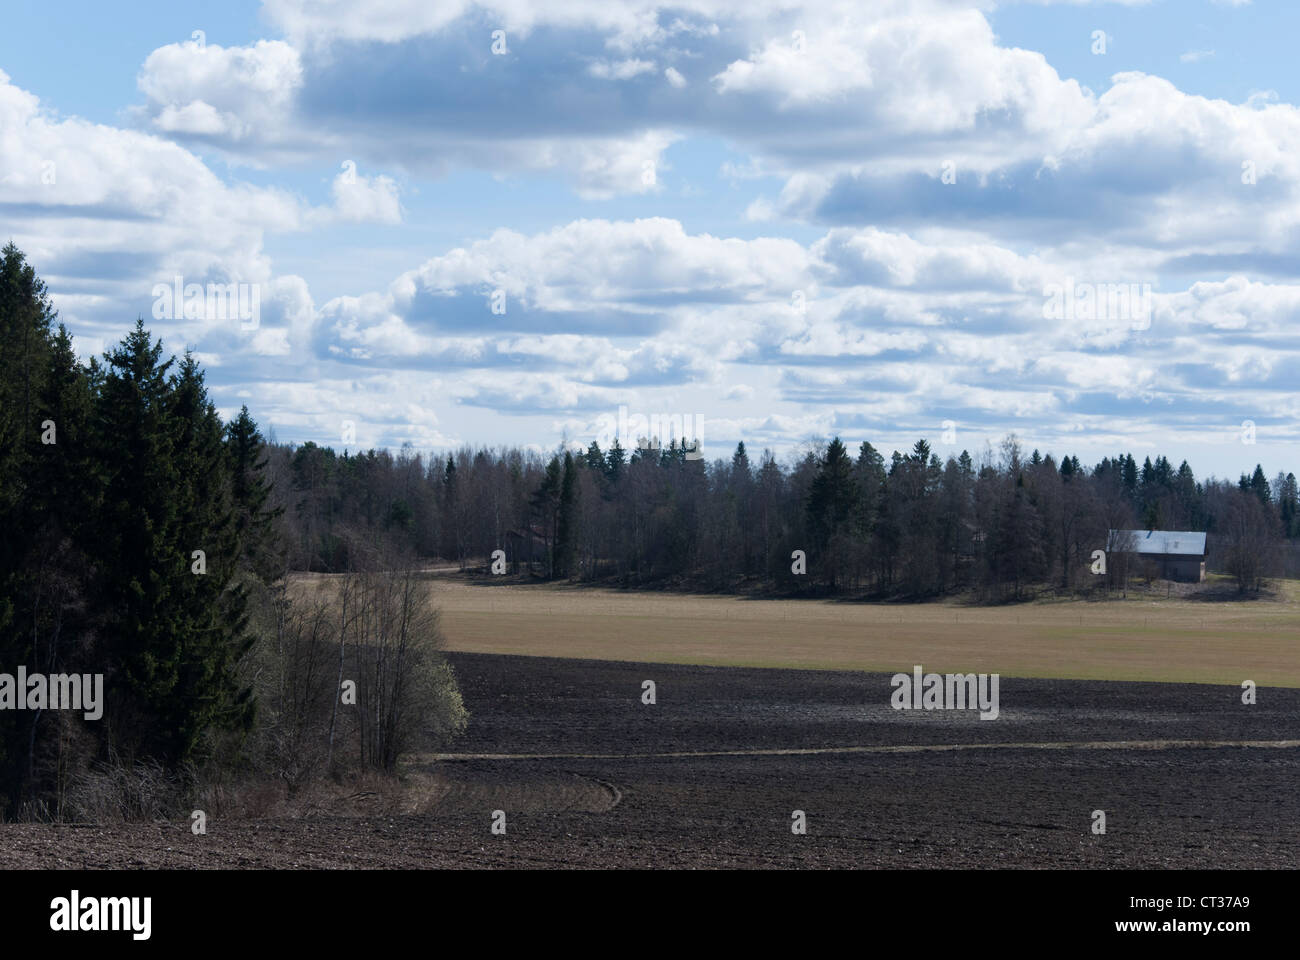 Finnish landscape - Stock Image